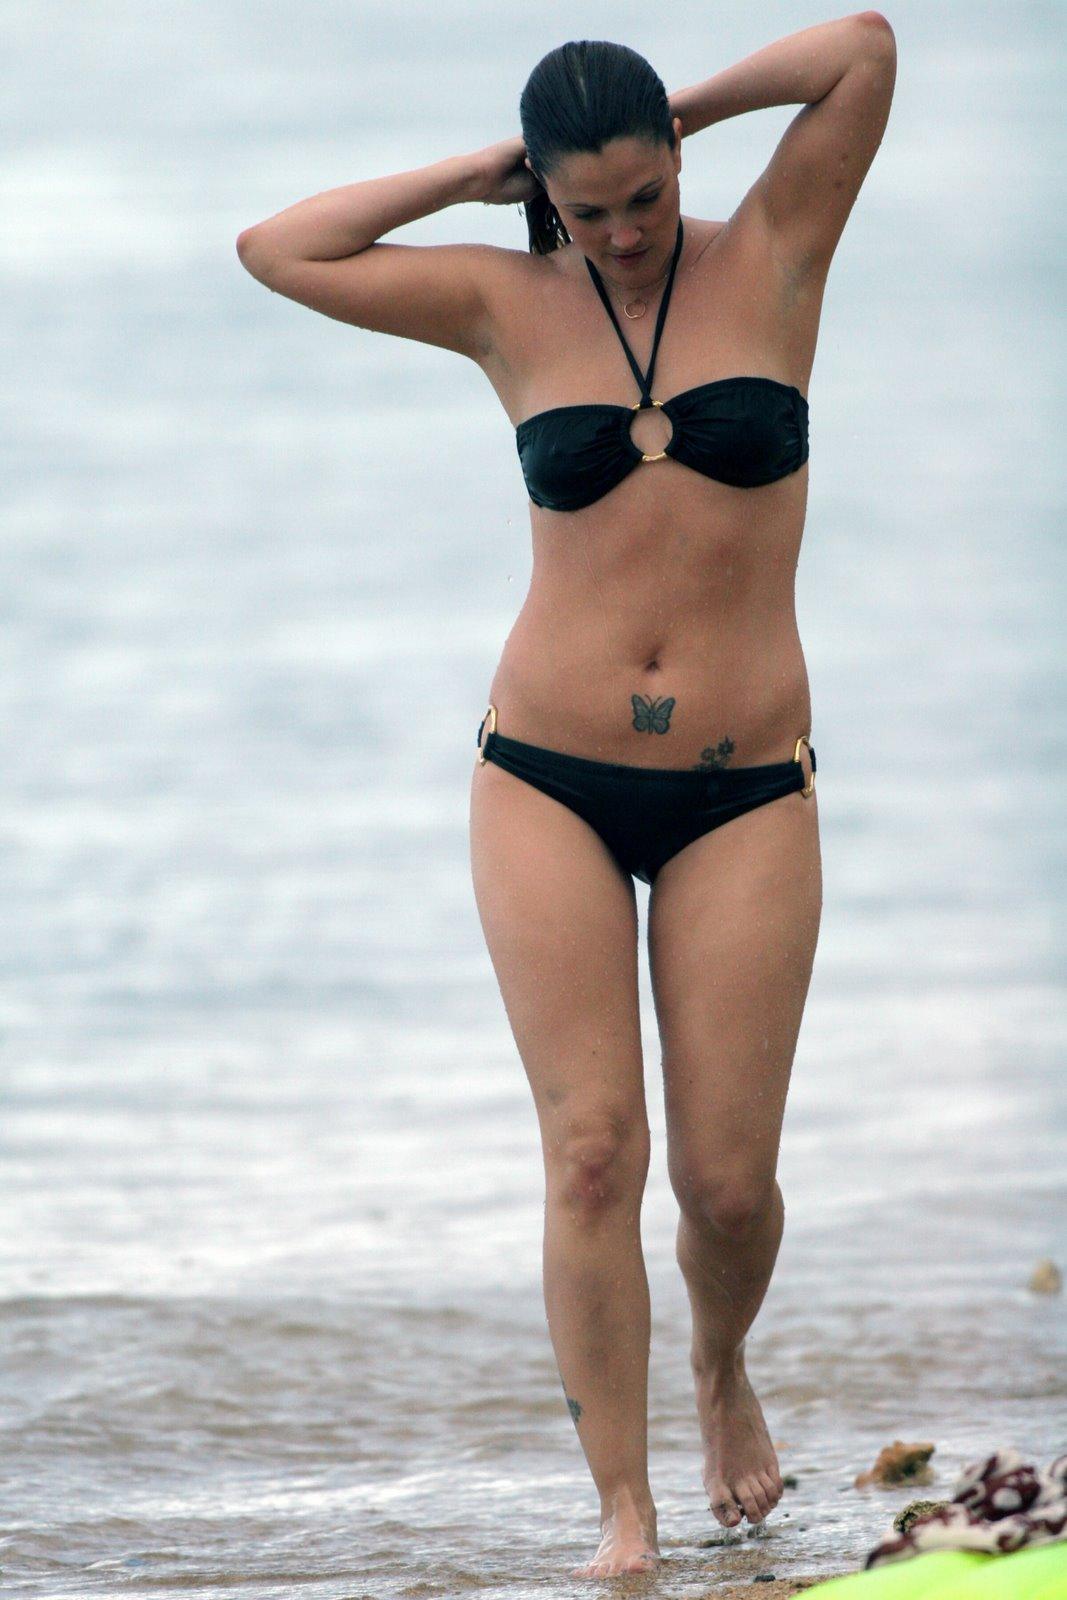 Drew Barrymore bikini picture